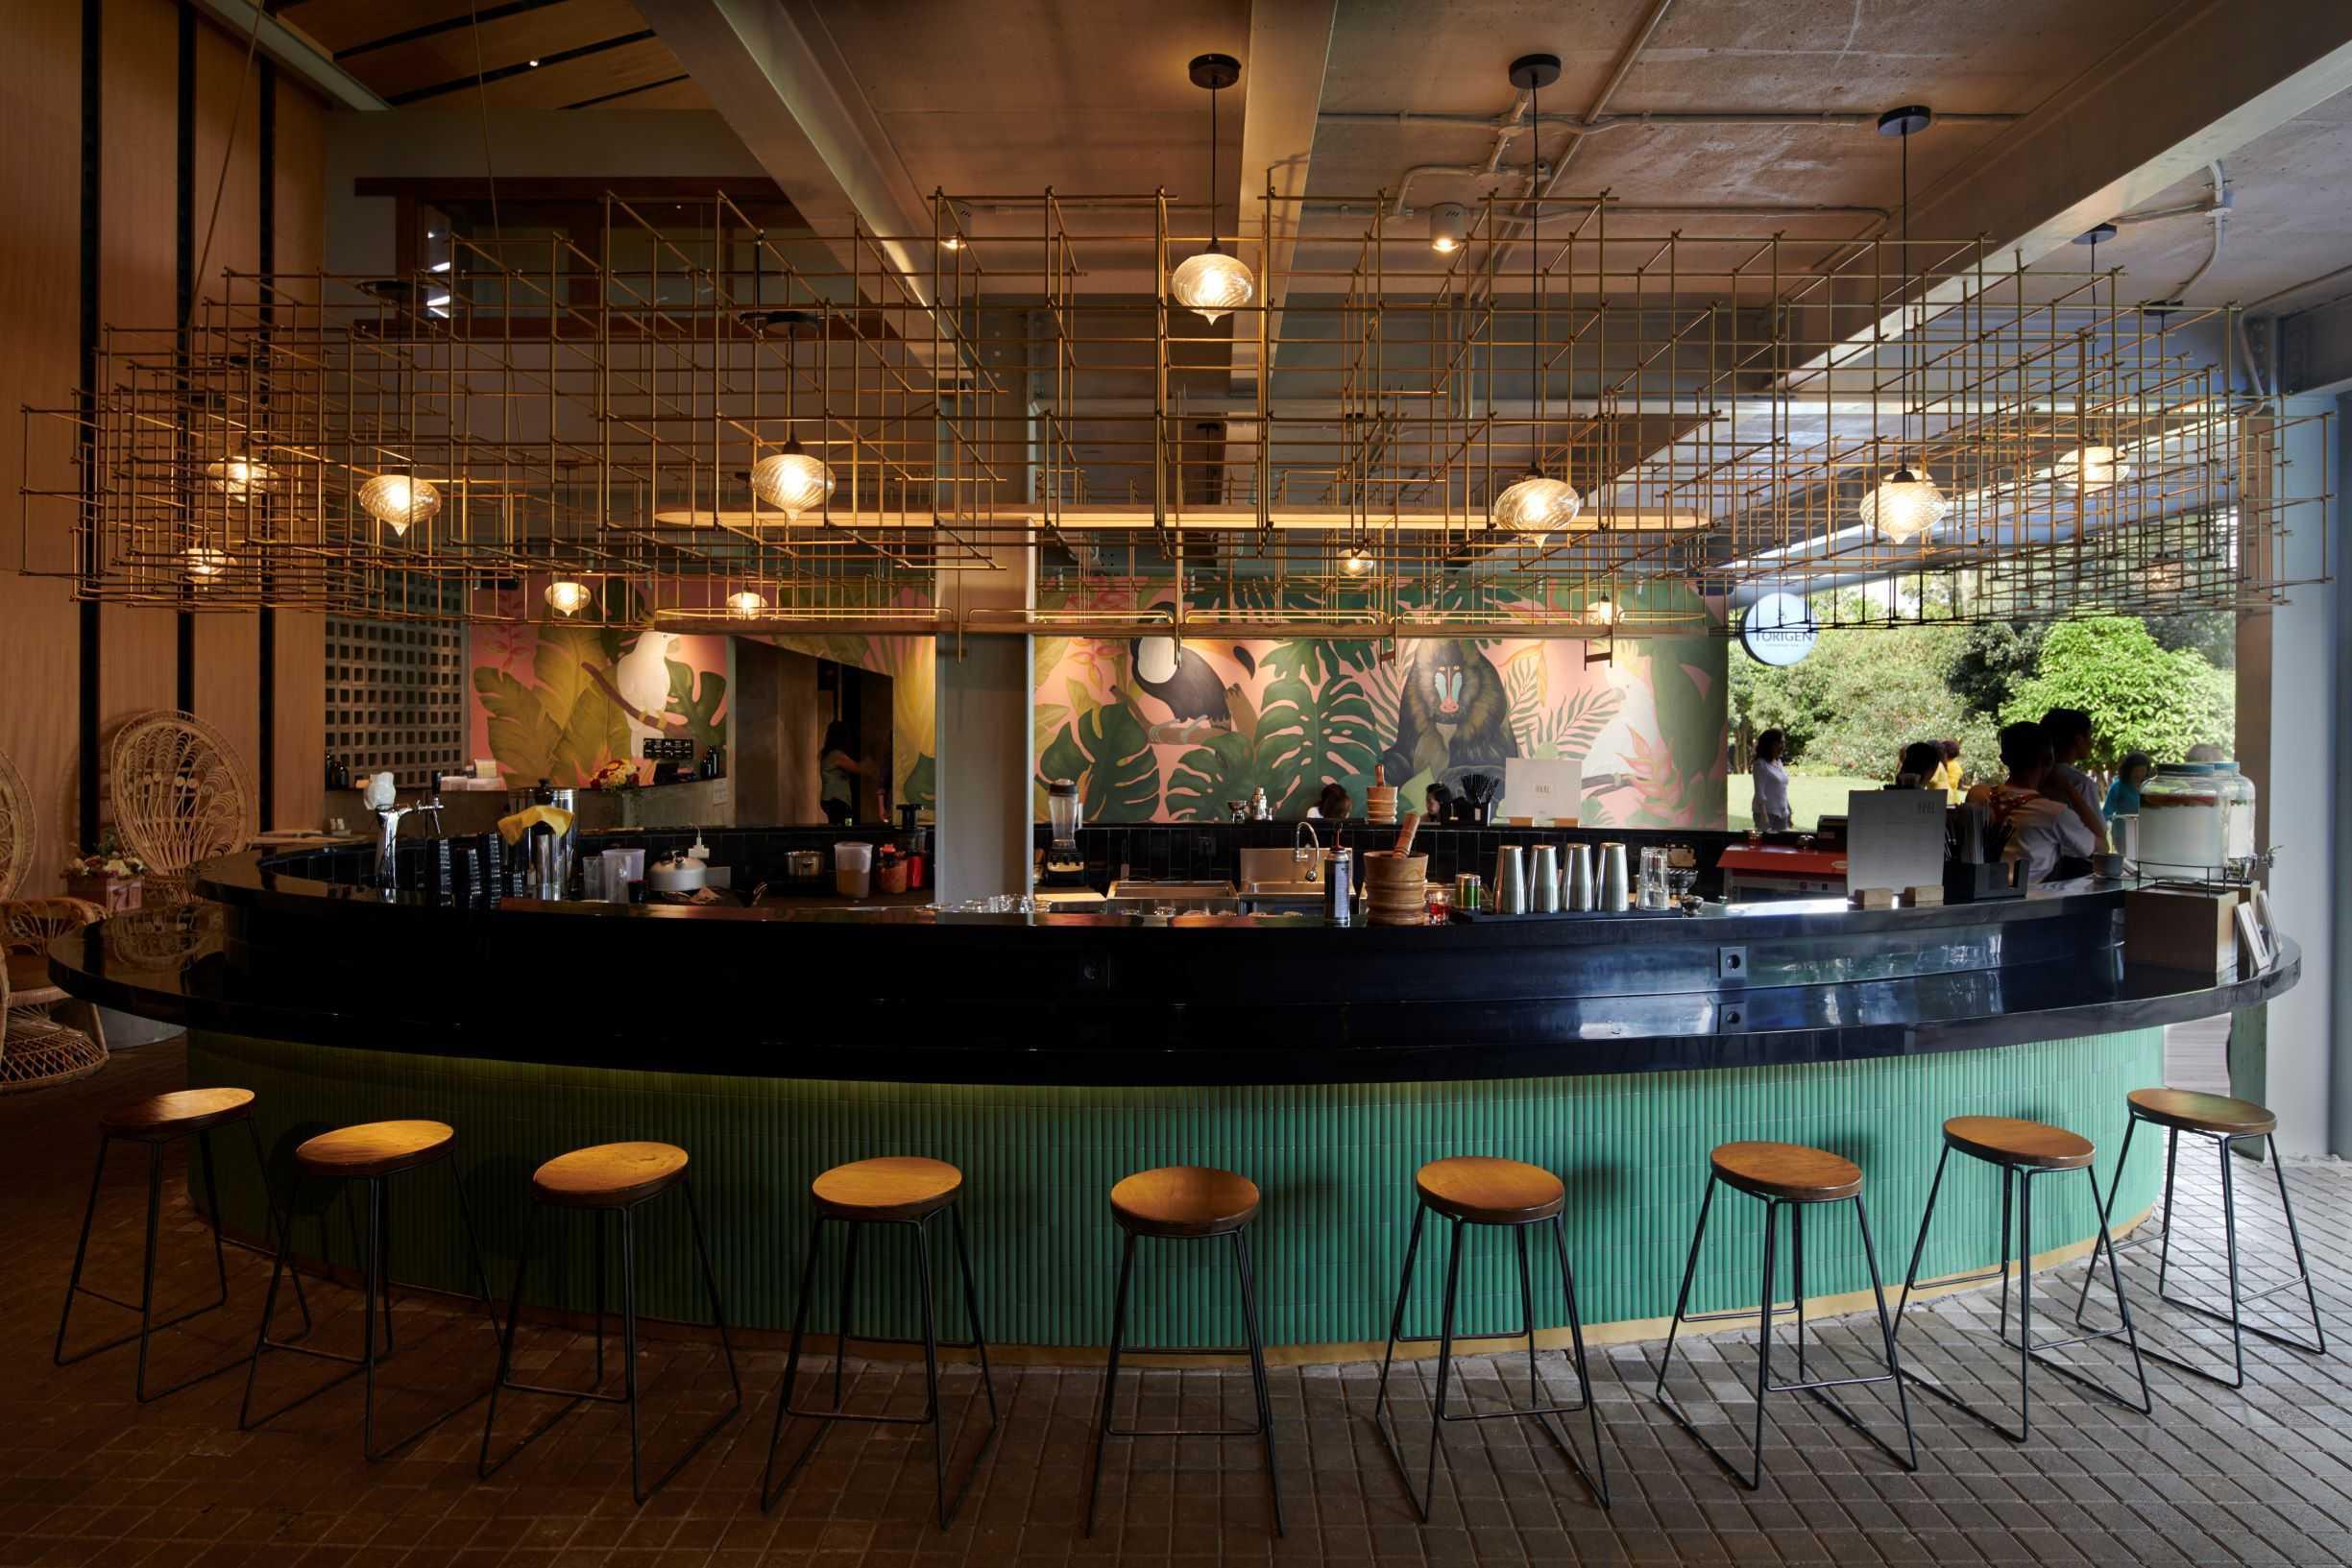 Hadivincent Architects Oval Bar Ciumbuleuit, Cidadap, Kota Bandung, Jawa Barat, Indonesia Ciumbuleuit, Cidadap, Kota Bandung, Jawa Barat, Indonesia Hadivincent-Architects-Oval-Bar   71520